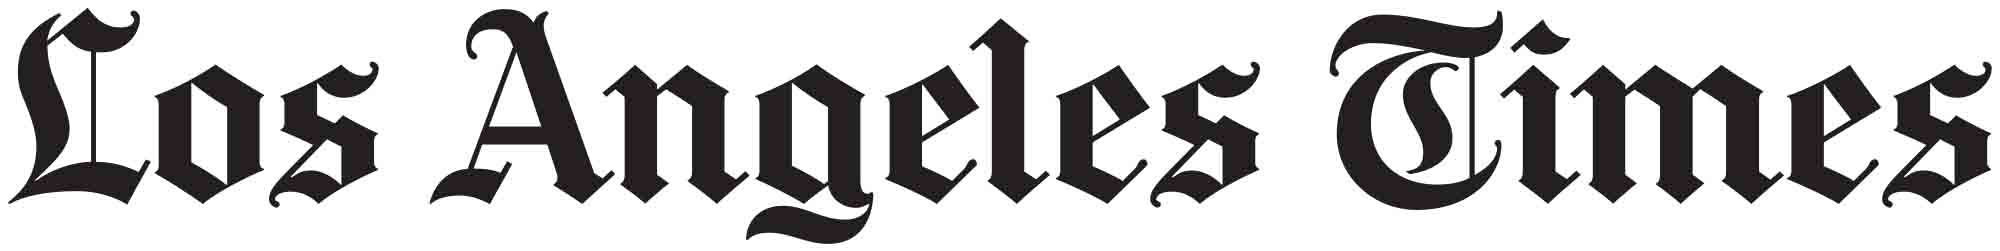 2000px-Los_Angeles_Times_logo.jpg